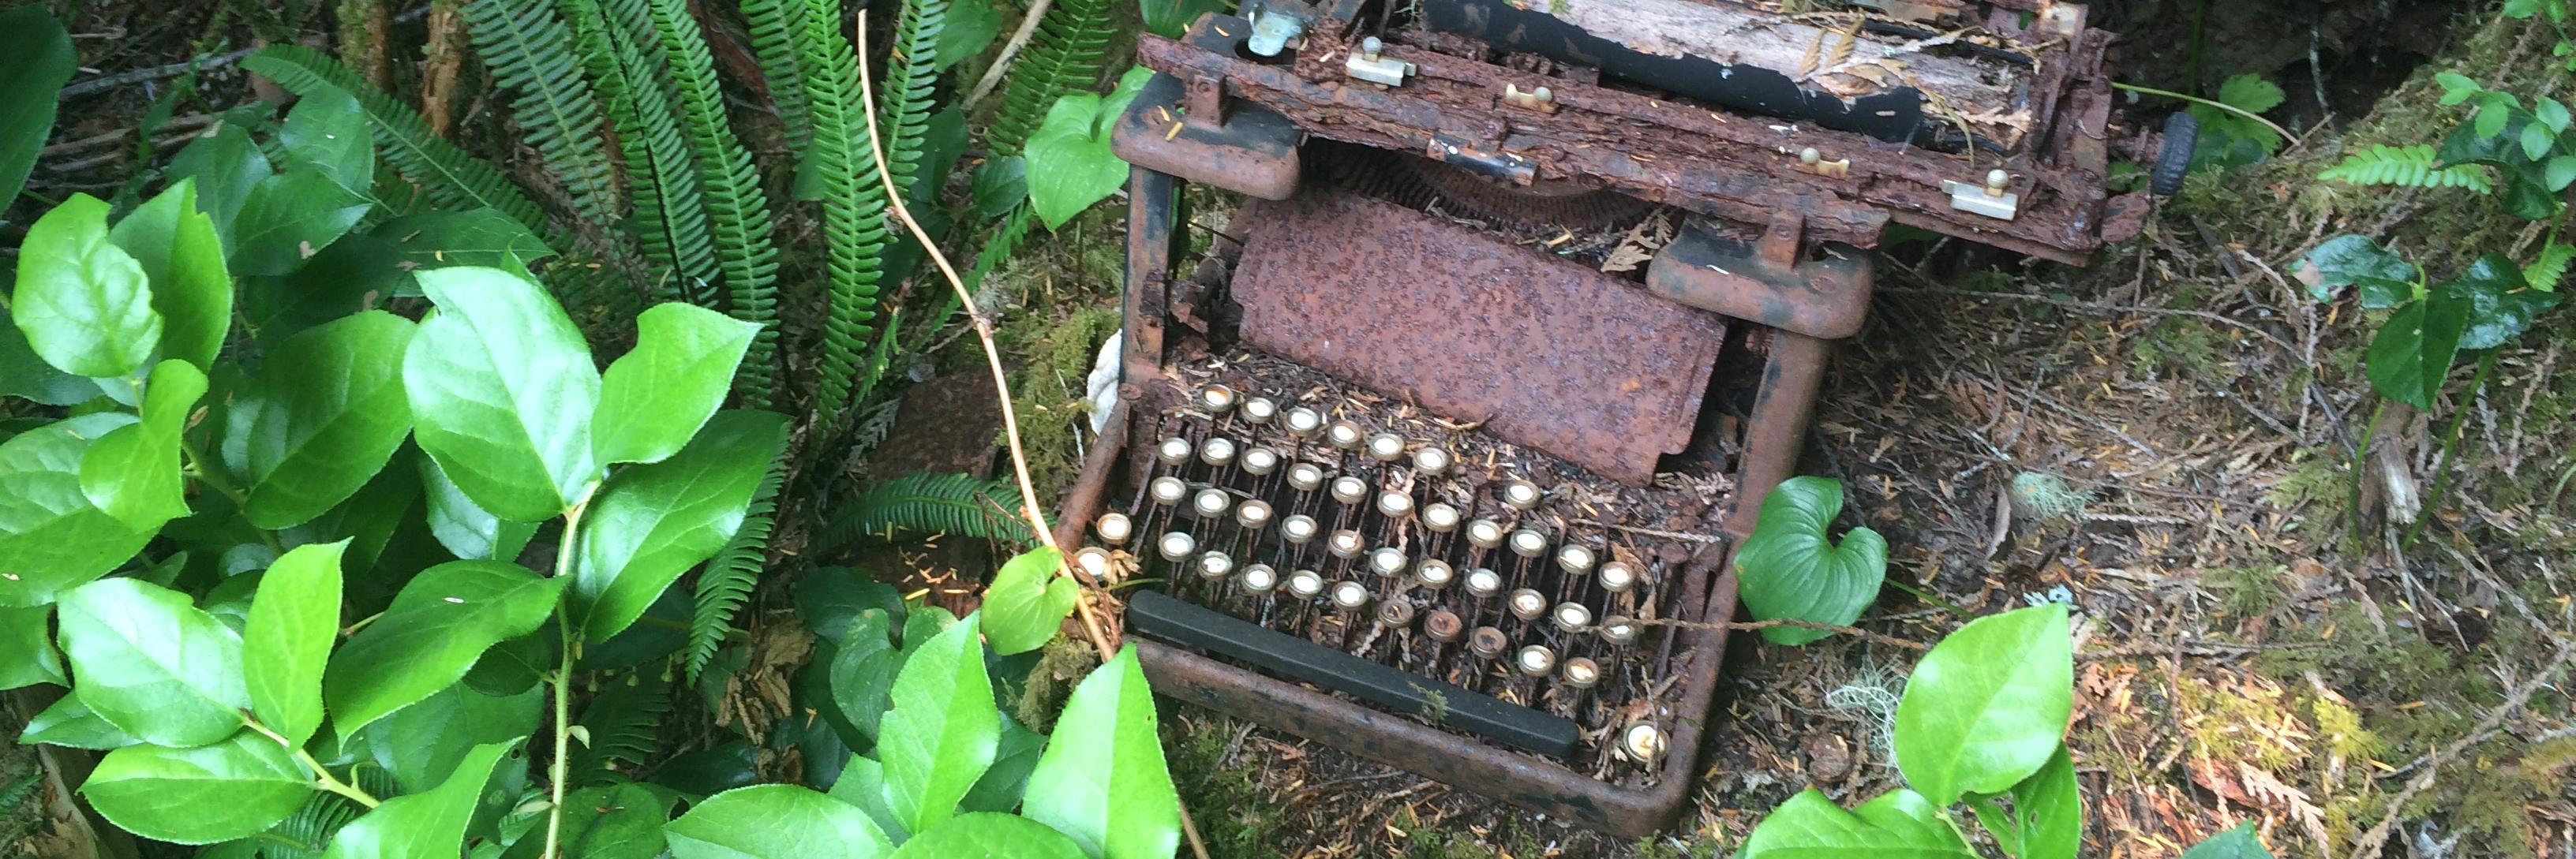 . Love letters #poemaday #365haiku #naturetherapy #naturetable #foundwhilewalking instagram.com/p/CBGg9JJpLB0/…